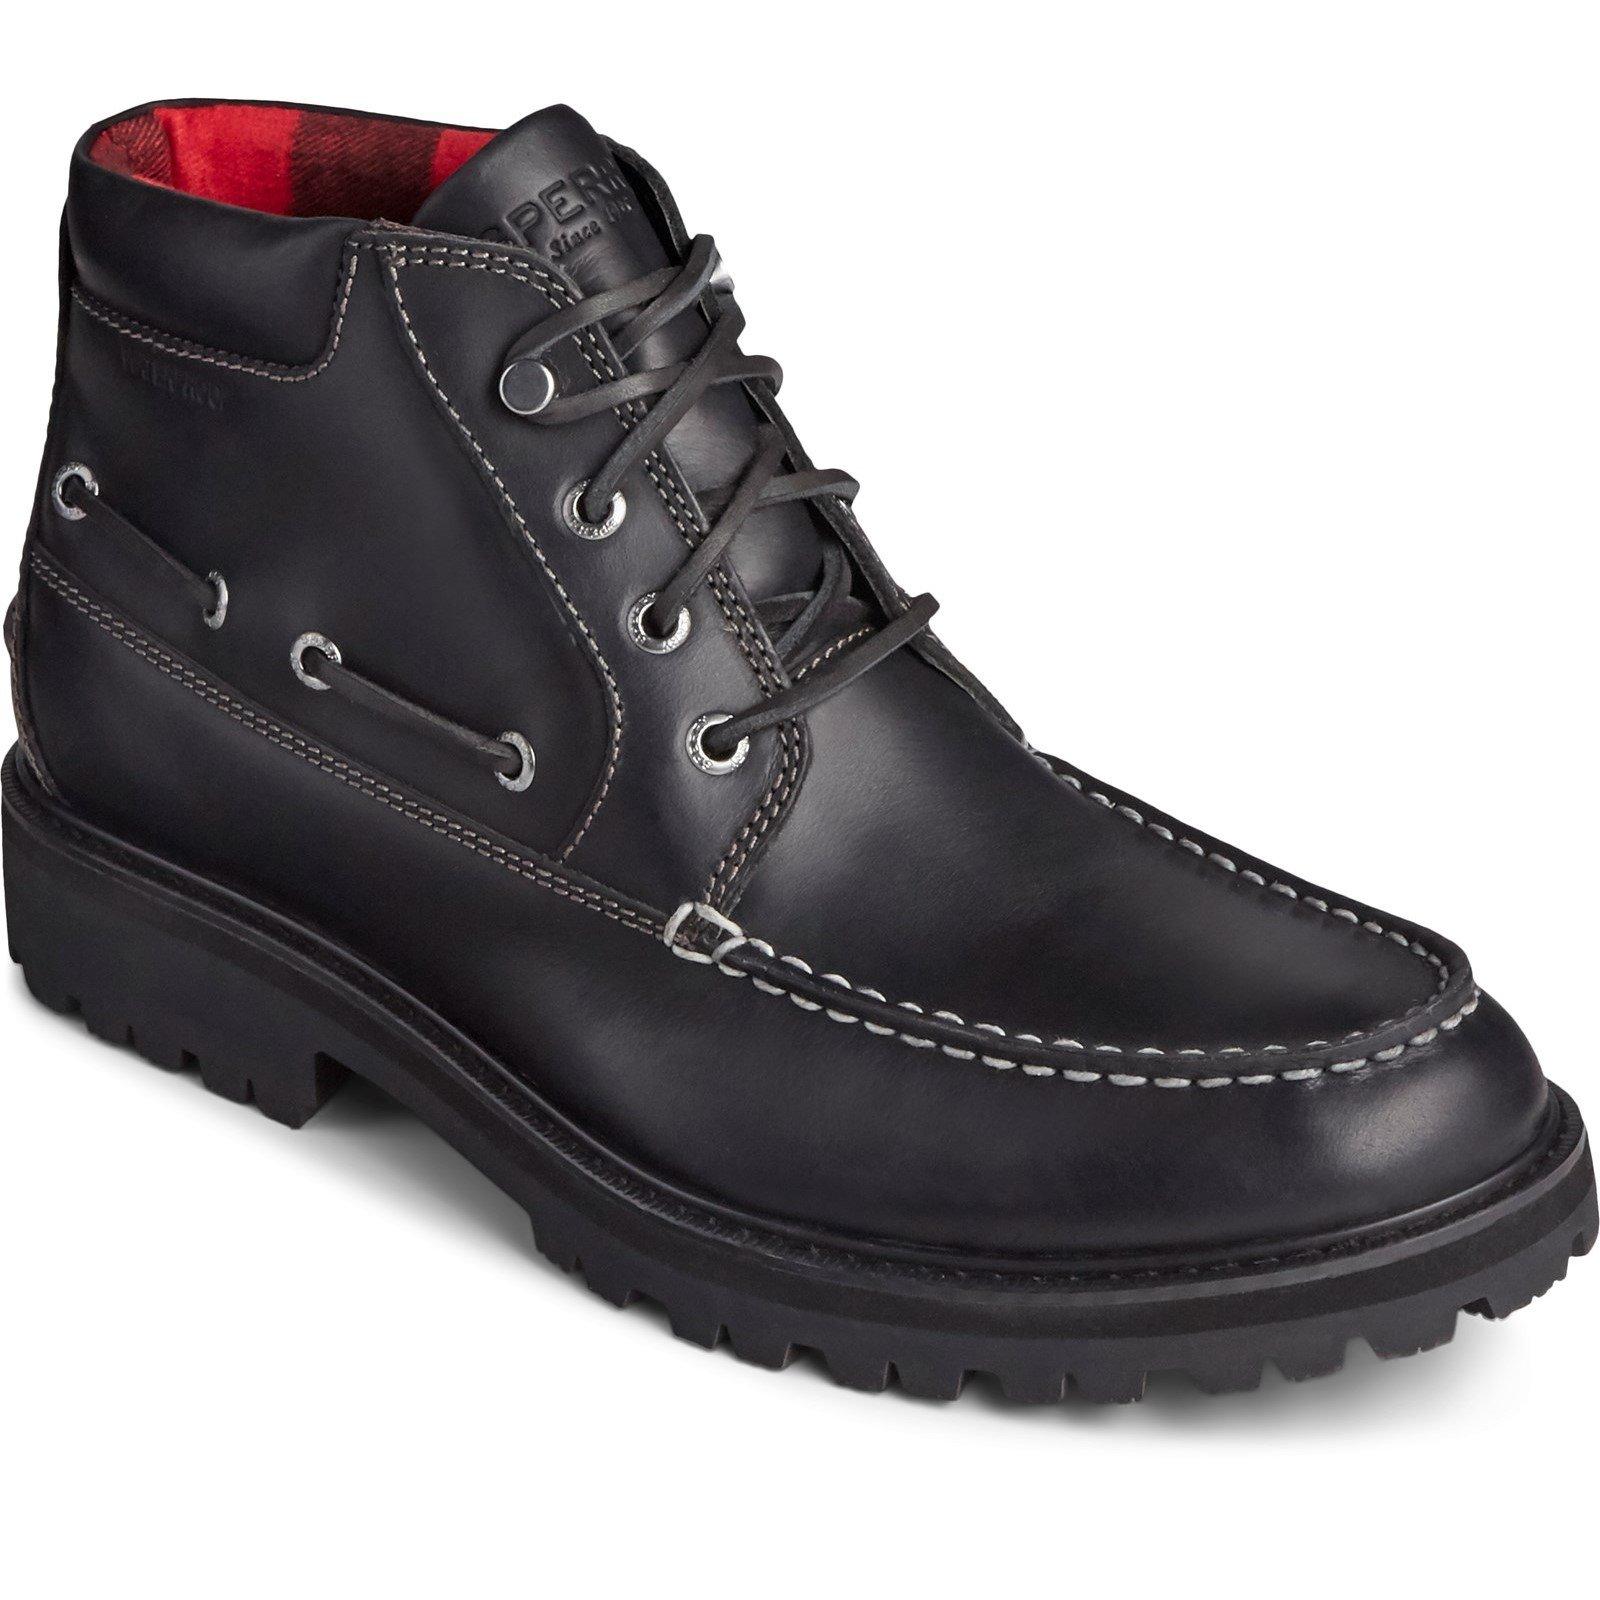 Sperry Men's Authentic Original Lug Chukka Boot Various Colours 32068 - Black 6